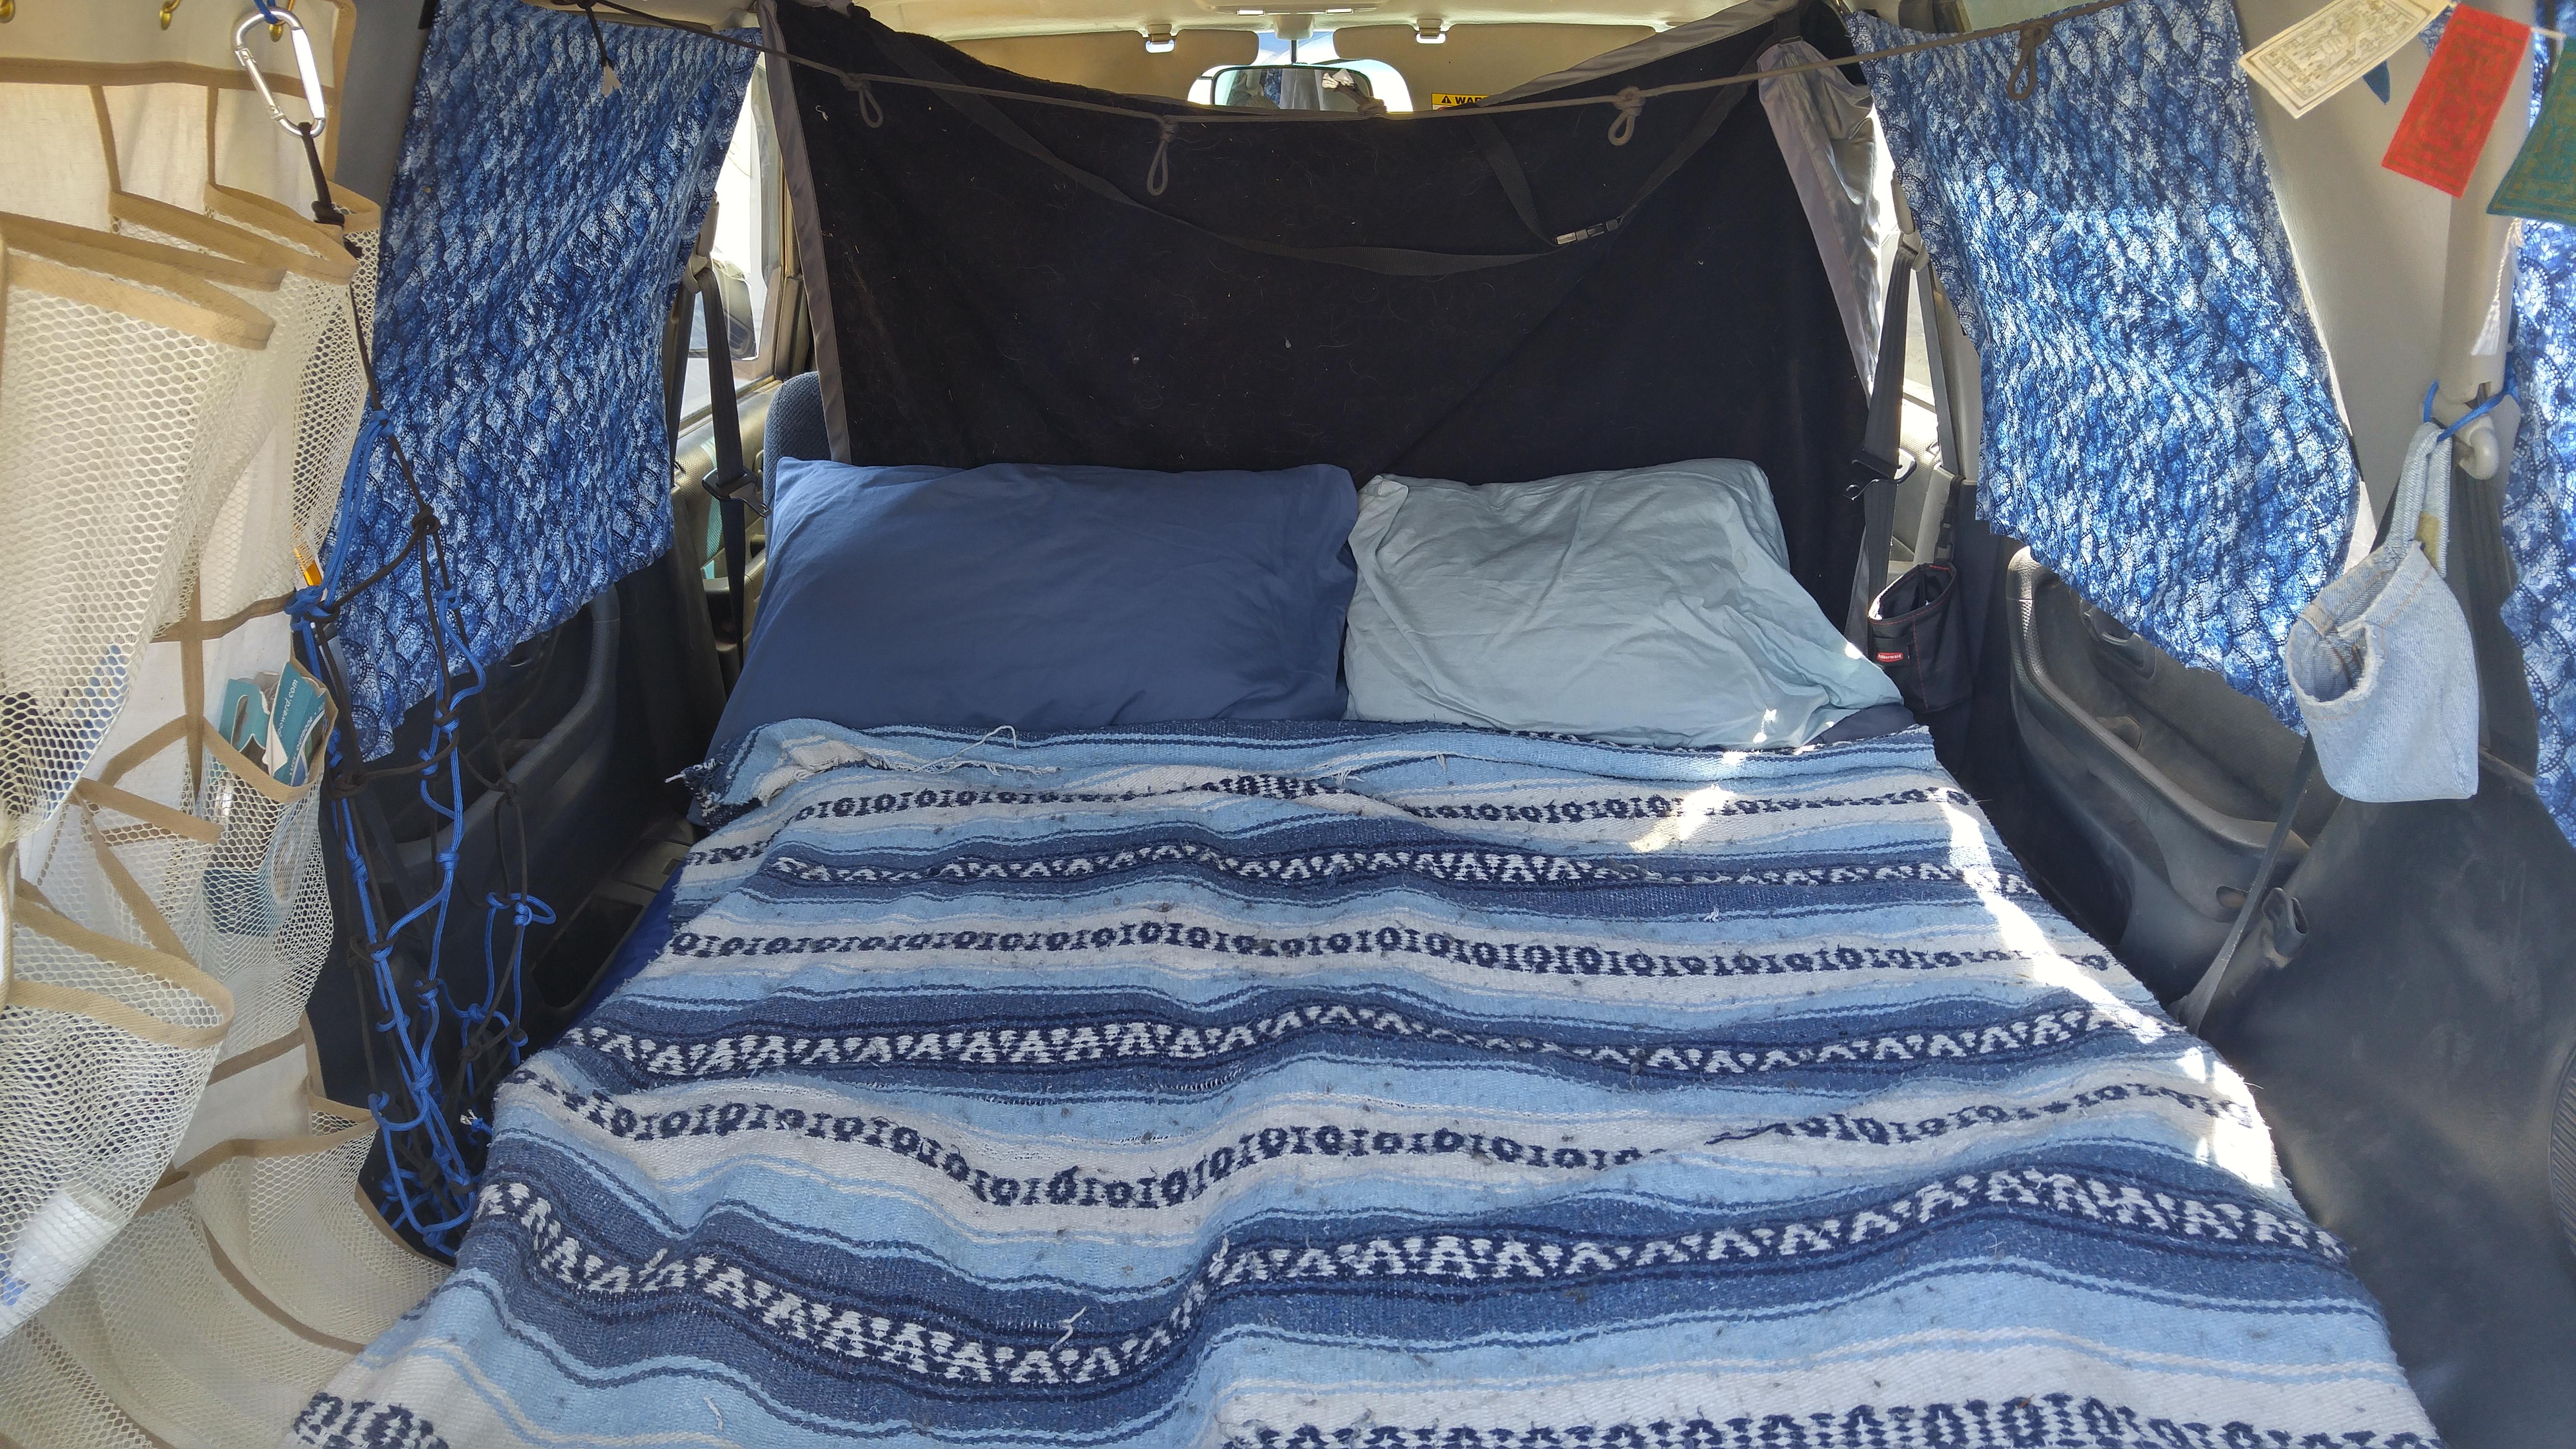 How I converted my Honda CR-V into a camper - Wild Mountain